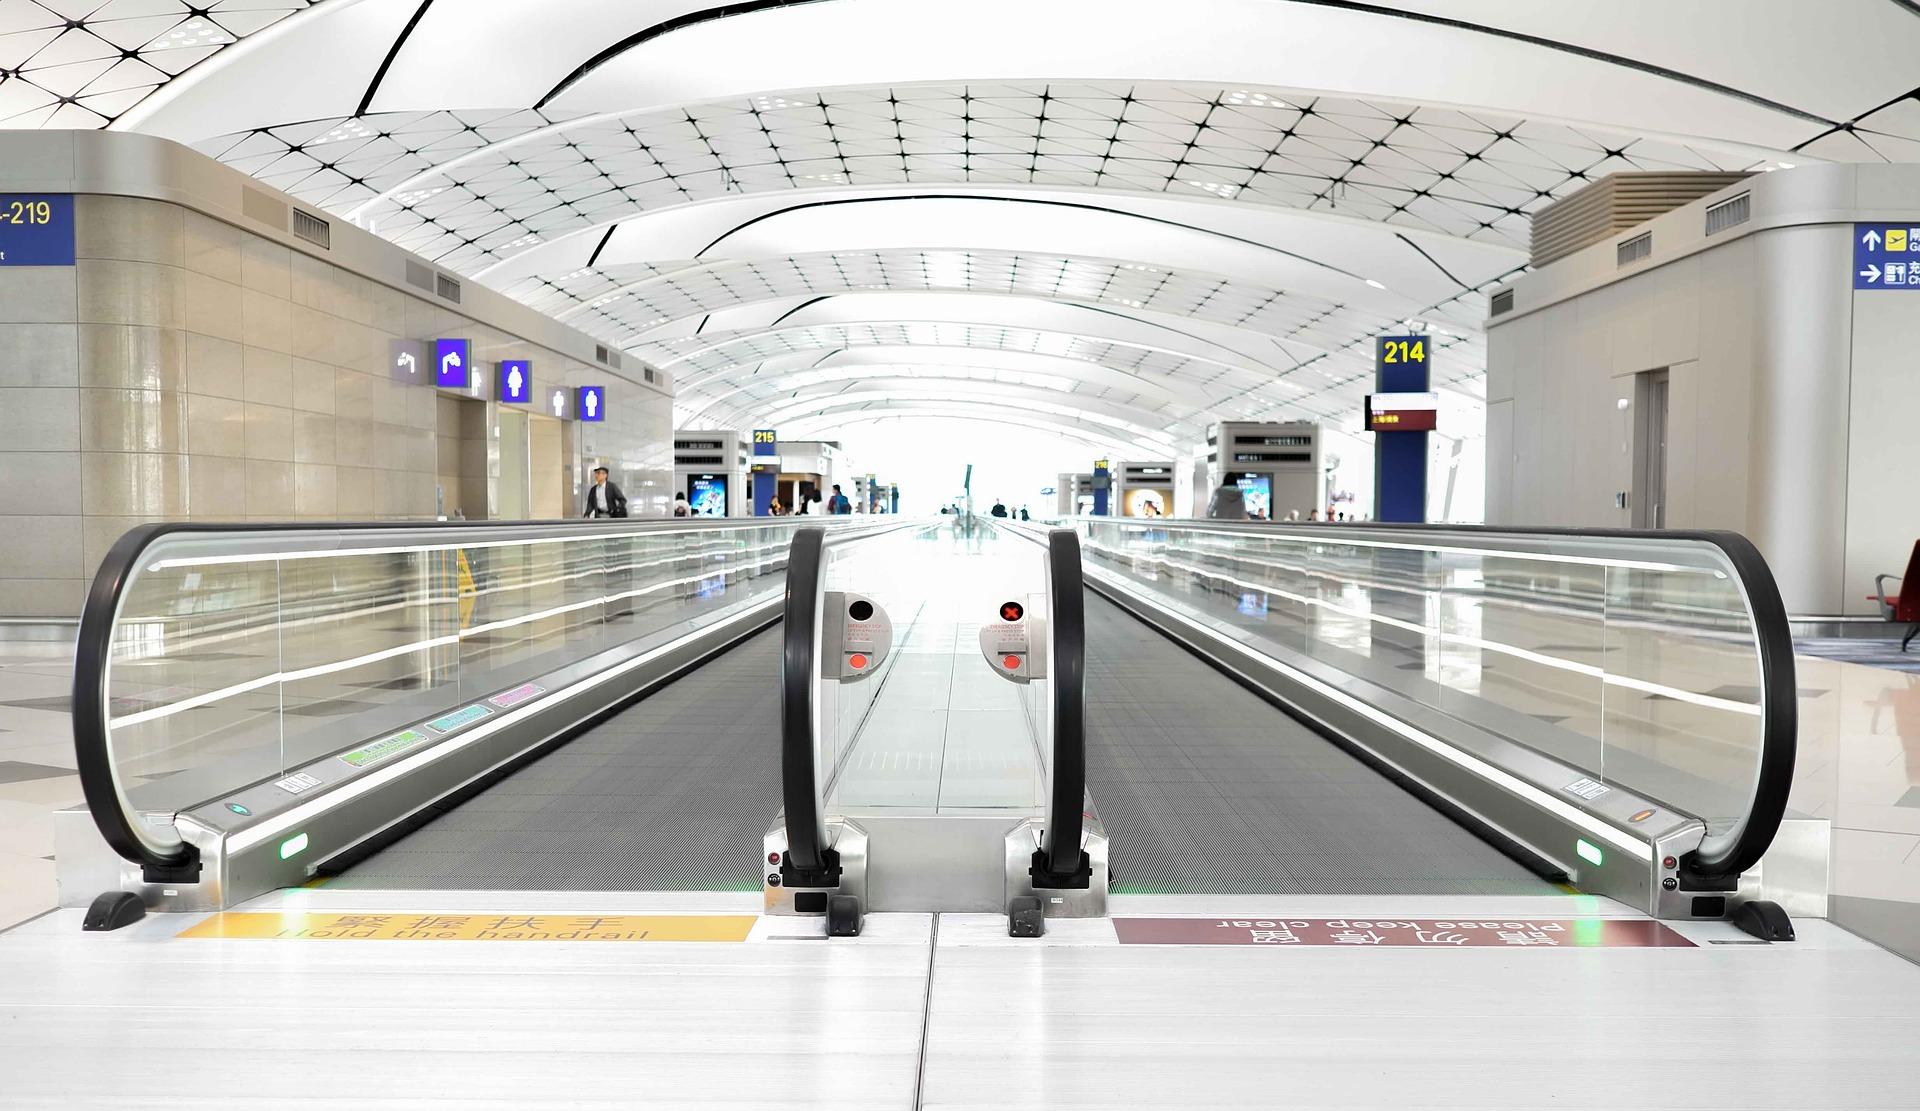 airport-2471662_1920.jpg